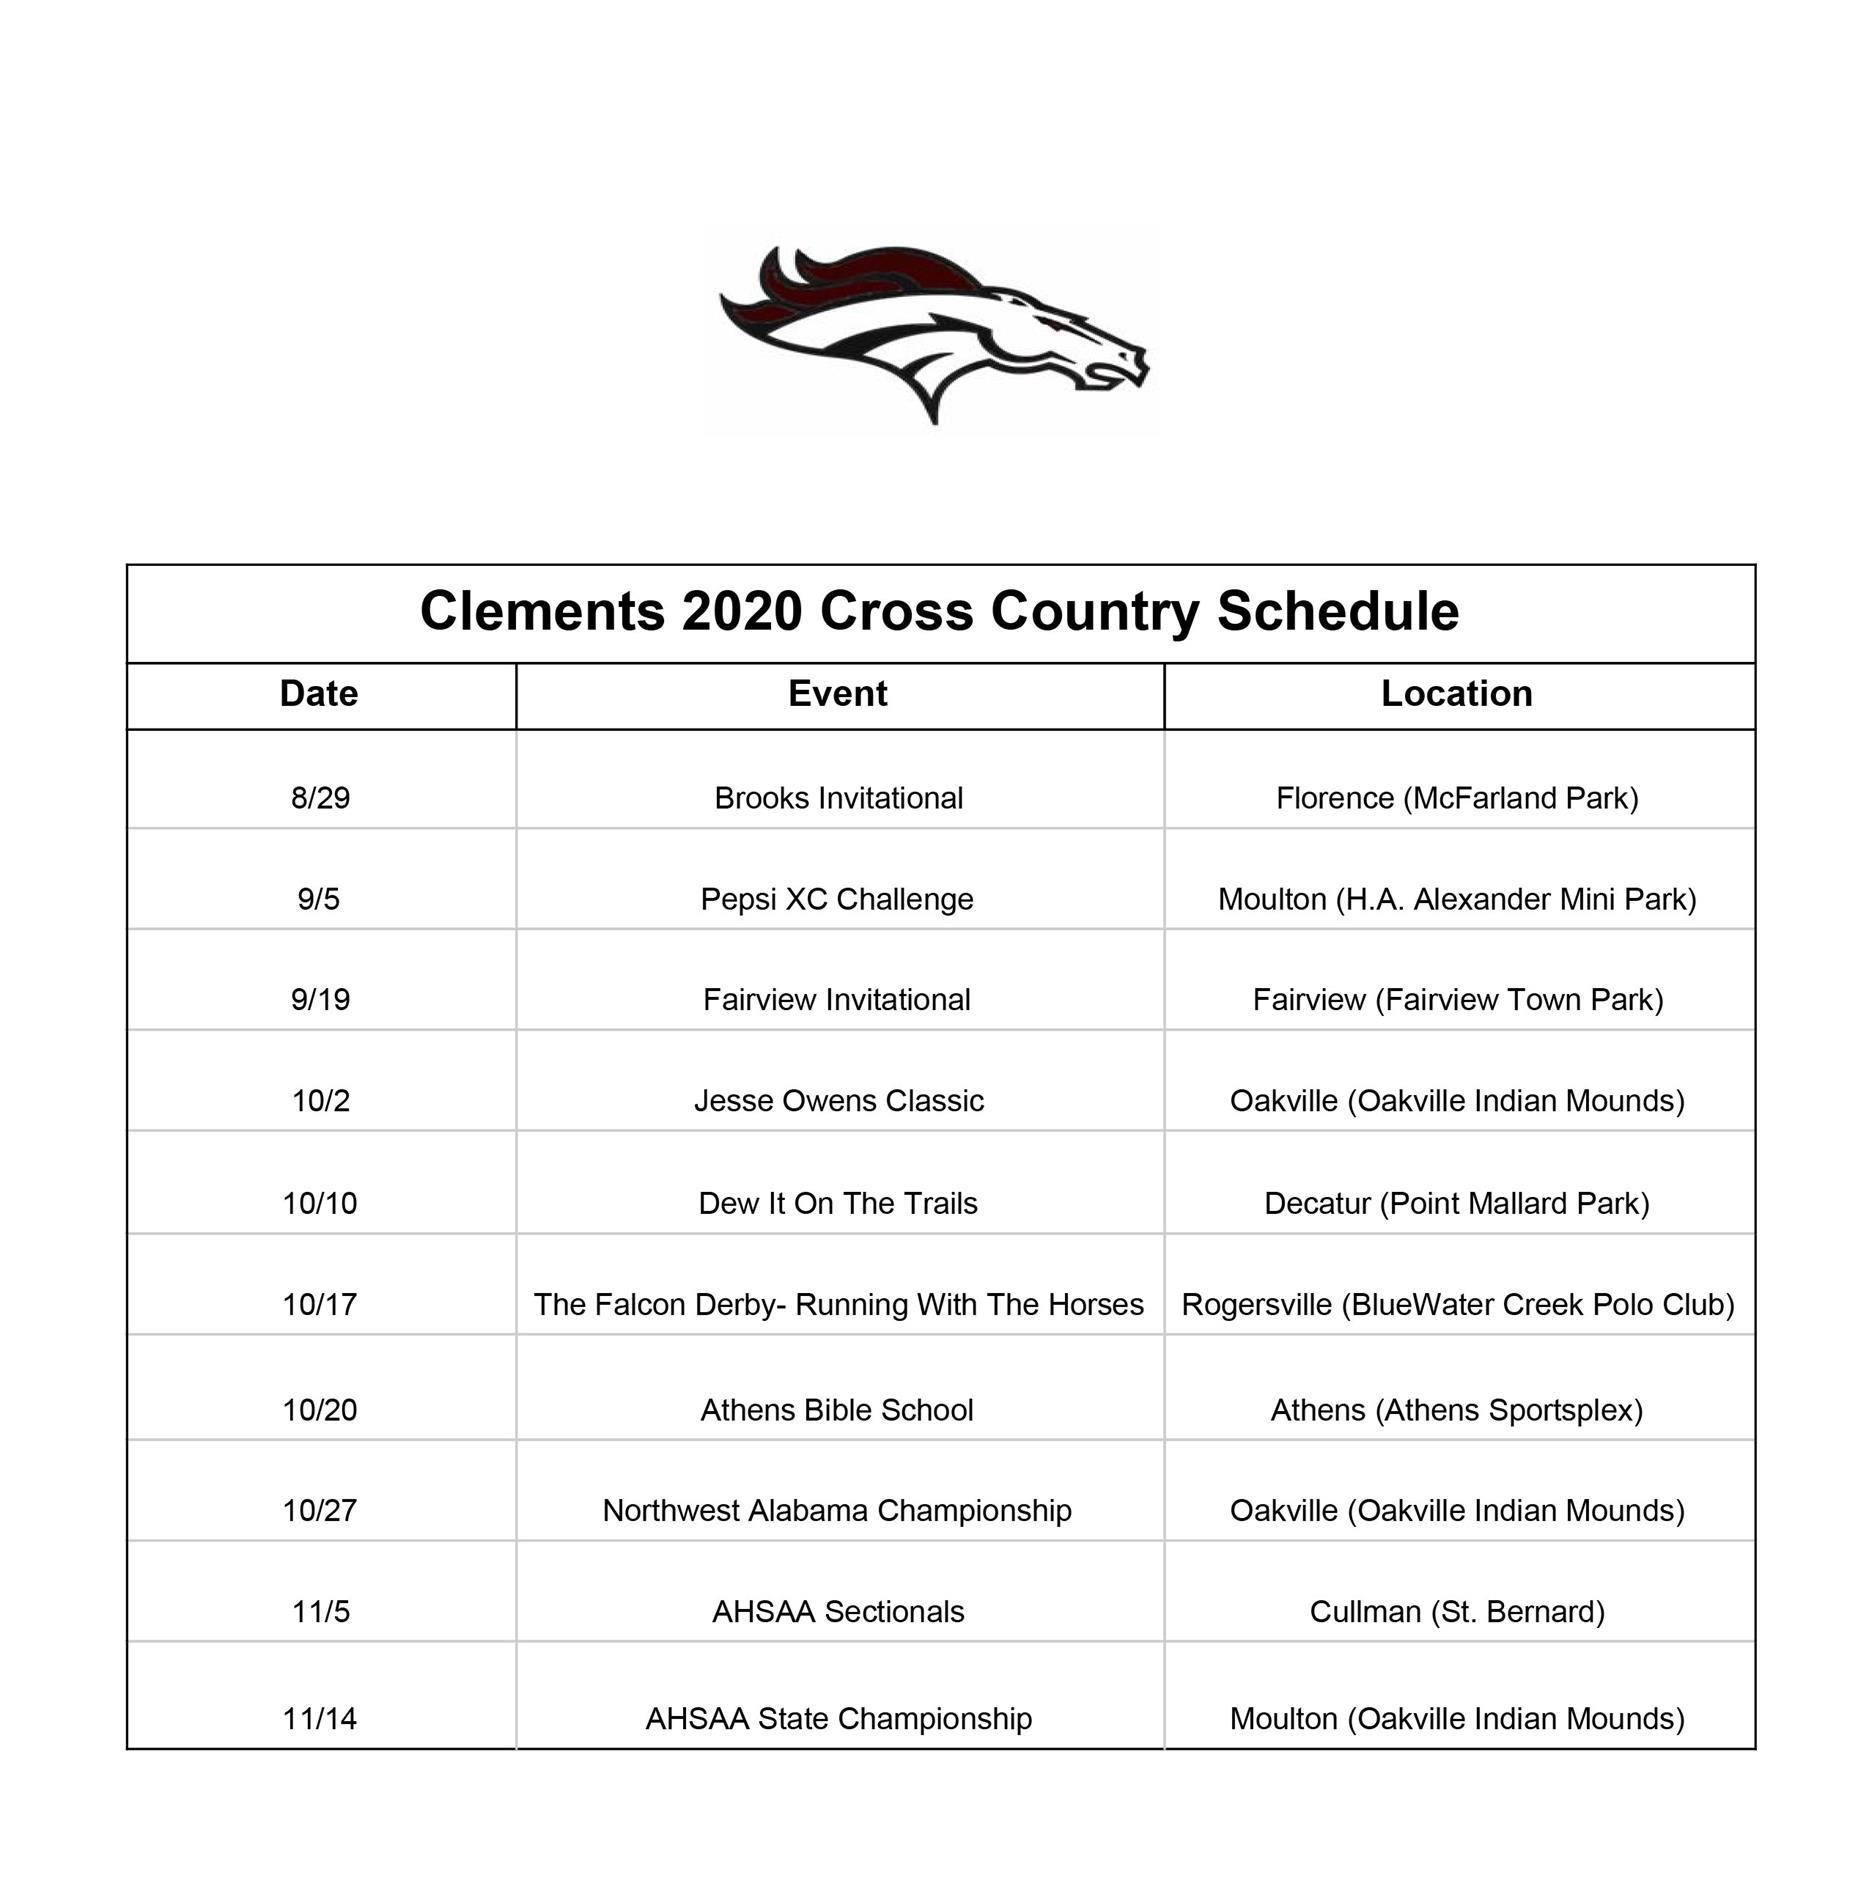 Clements Cross County Schedule